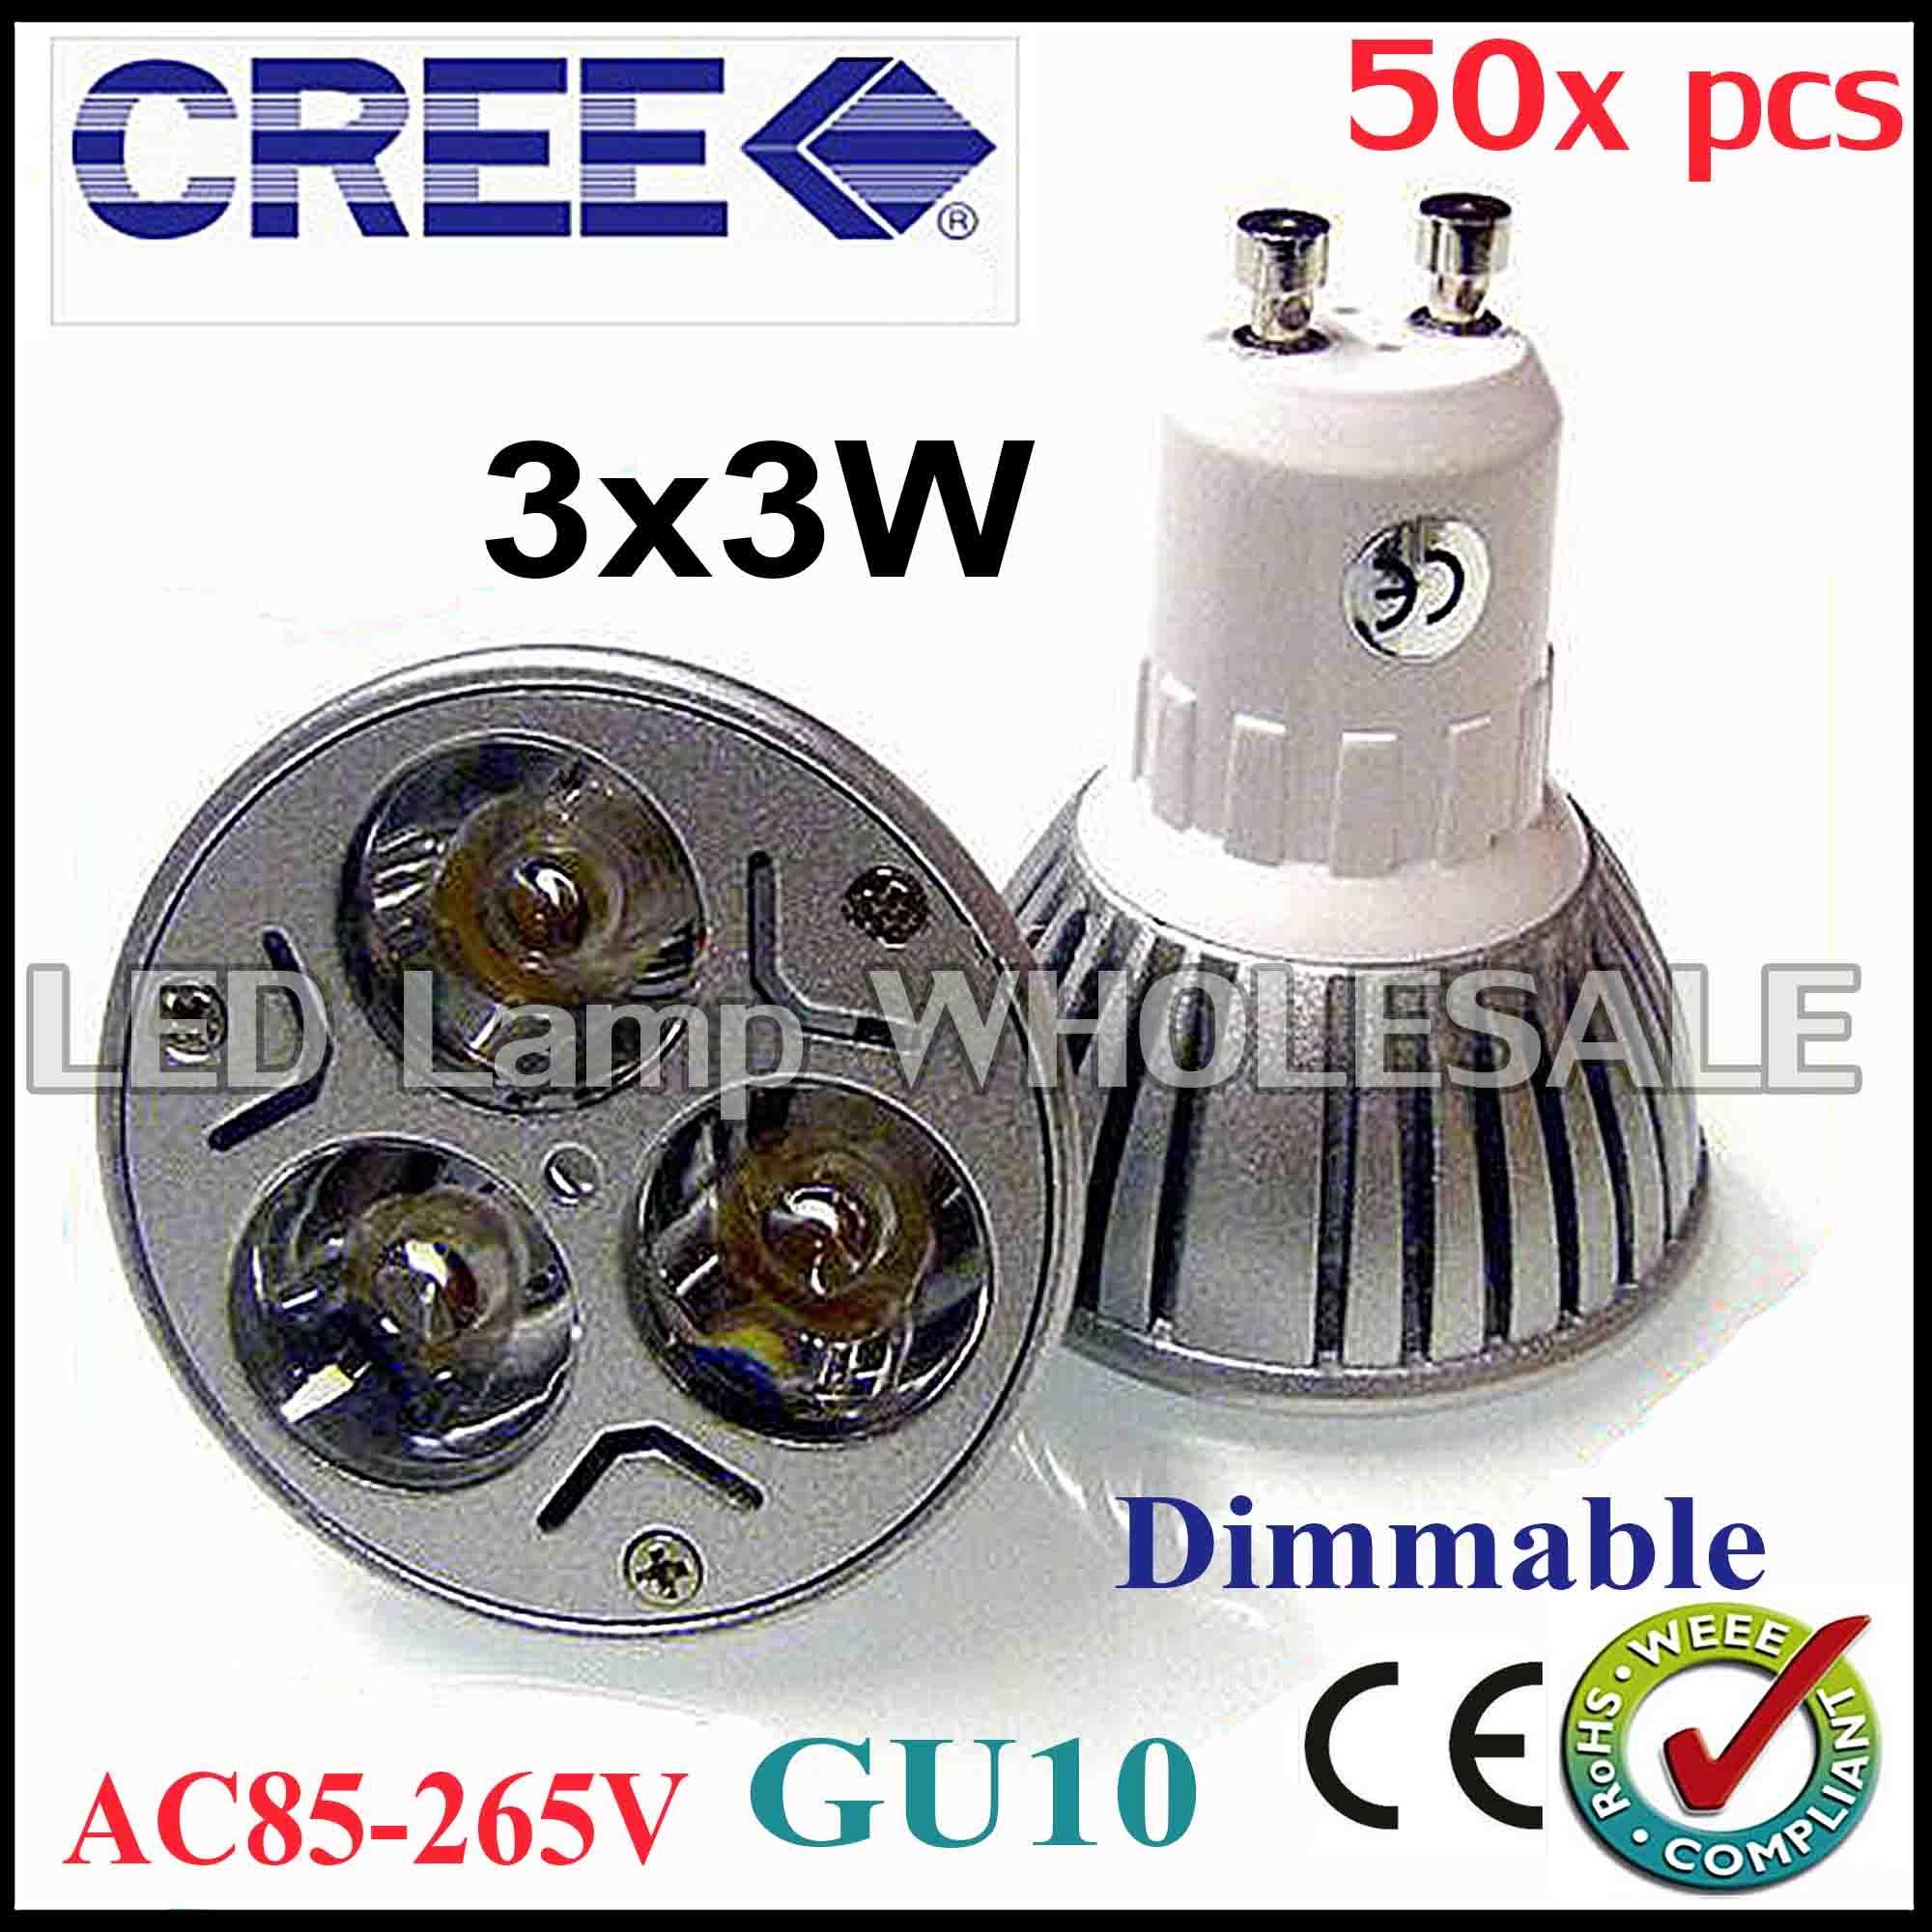 50X High Power Dimmable GU10 E27 MR16 3x3W 9W Spotlight Lamp CREE LED